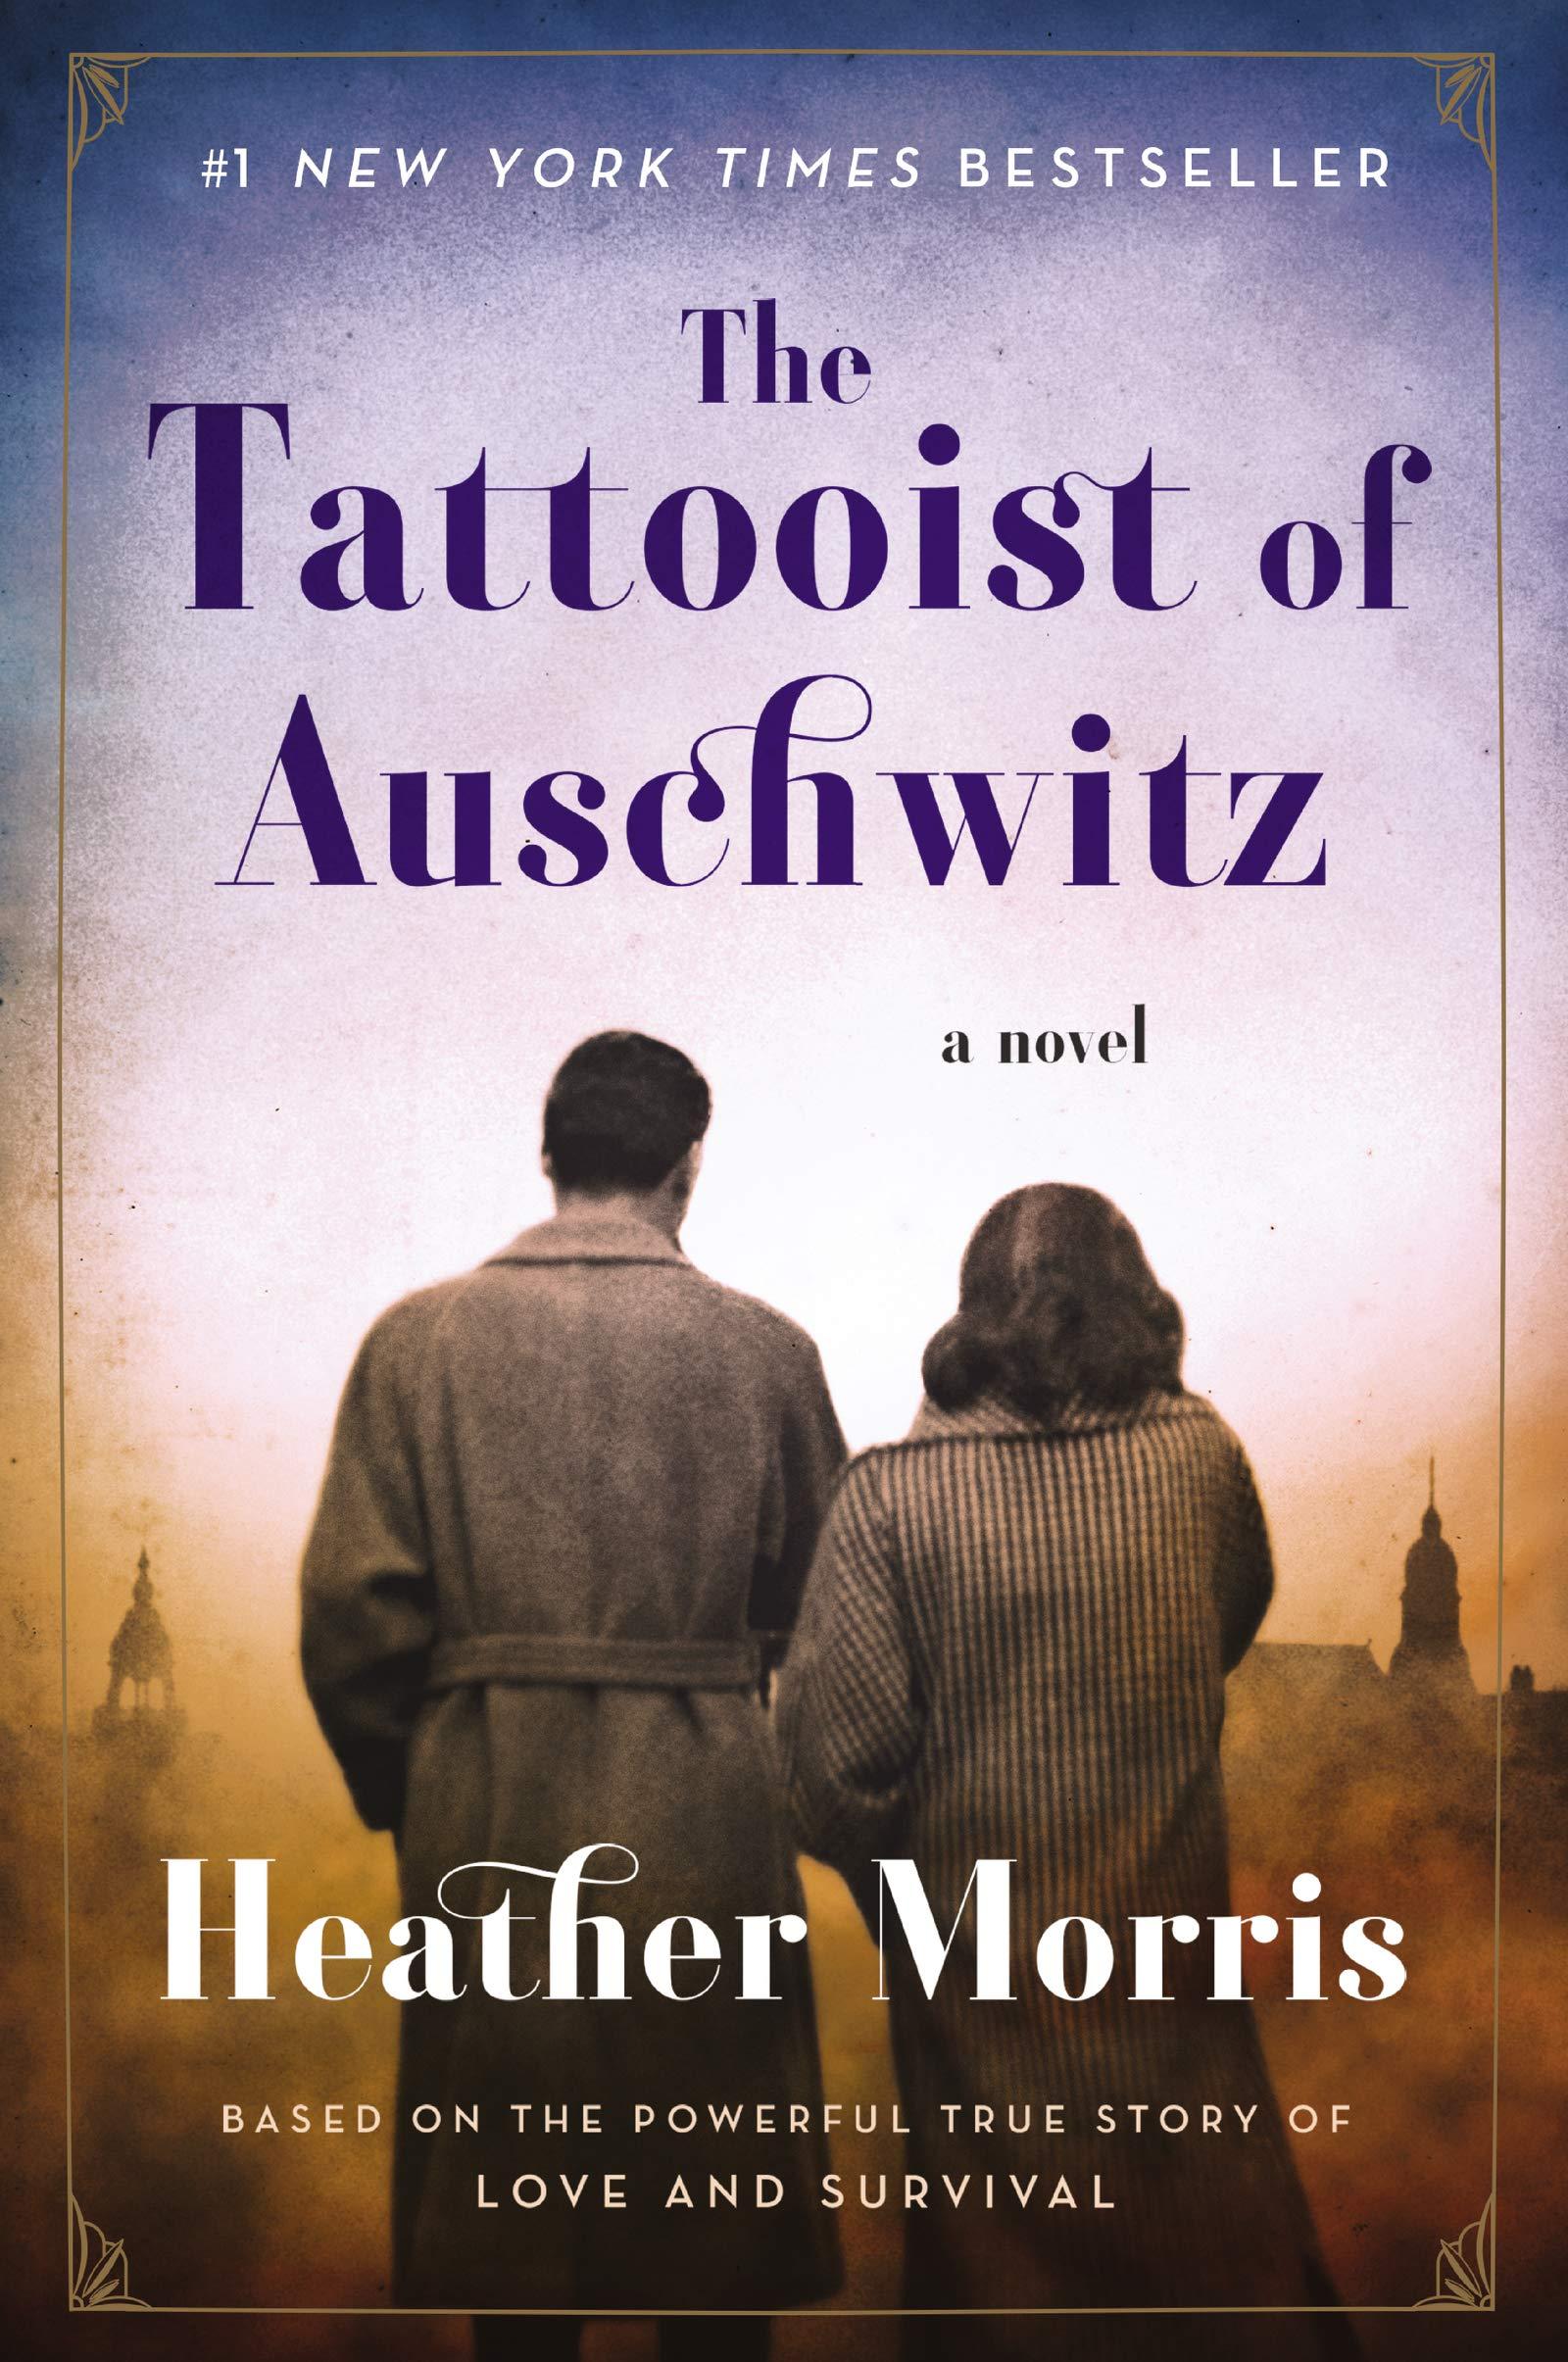 The Tattooist of Auschwitz: A Novel by Harper